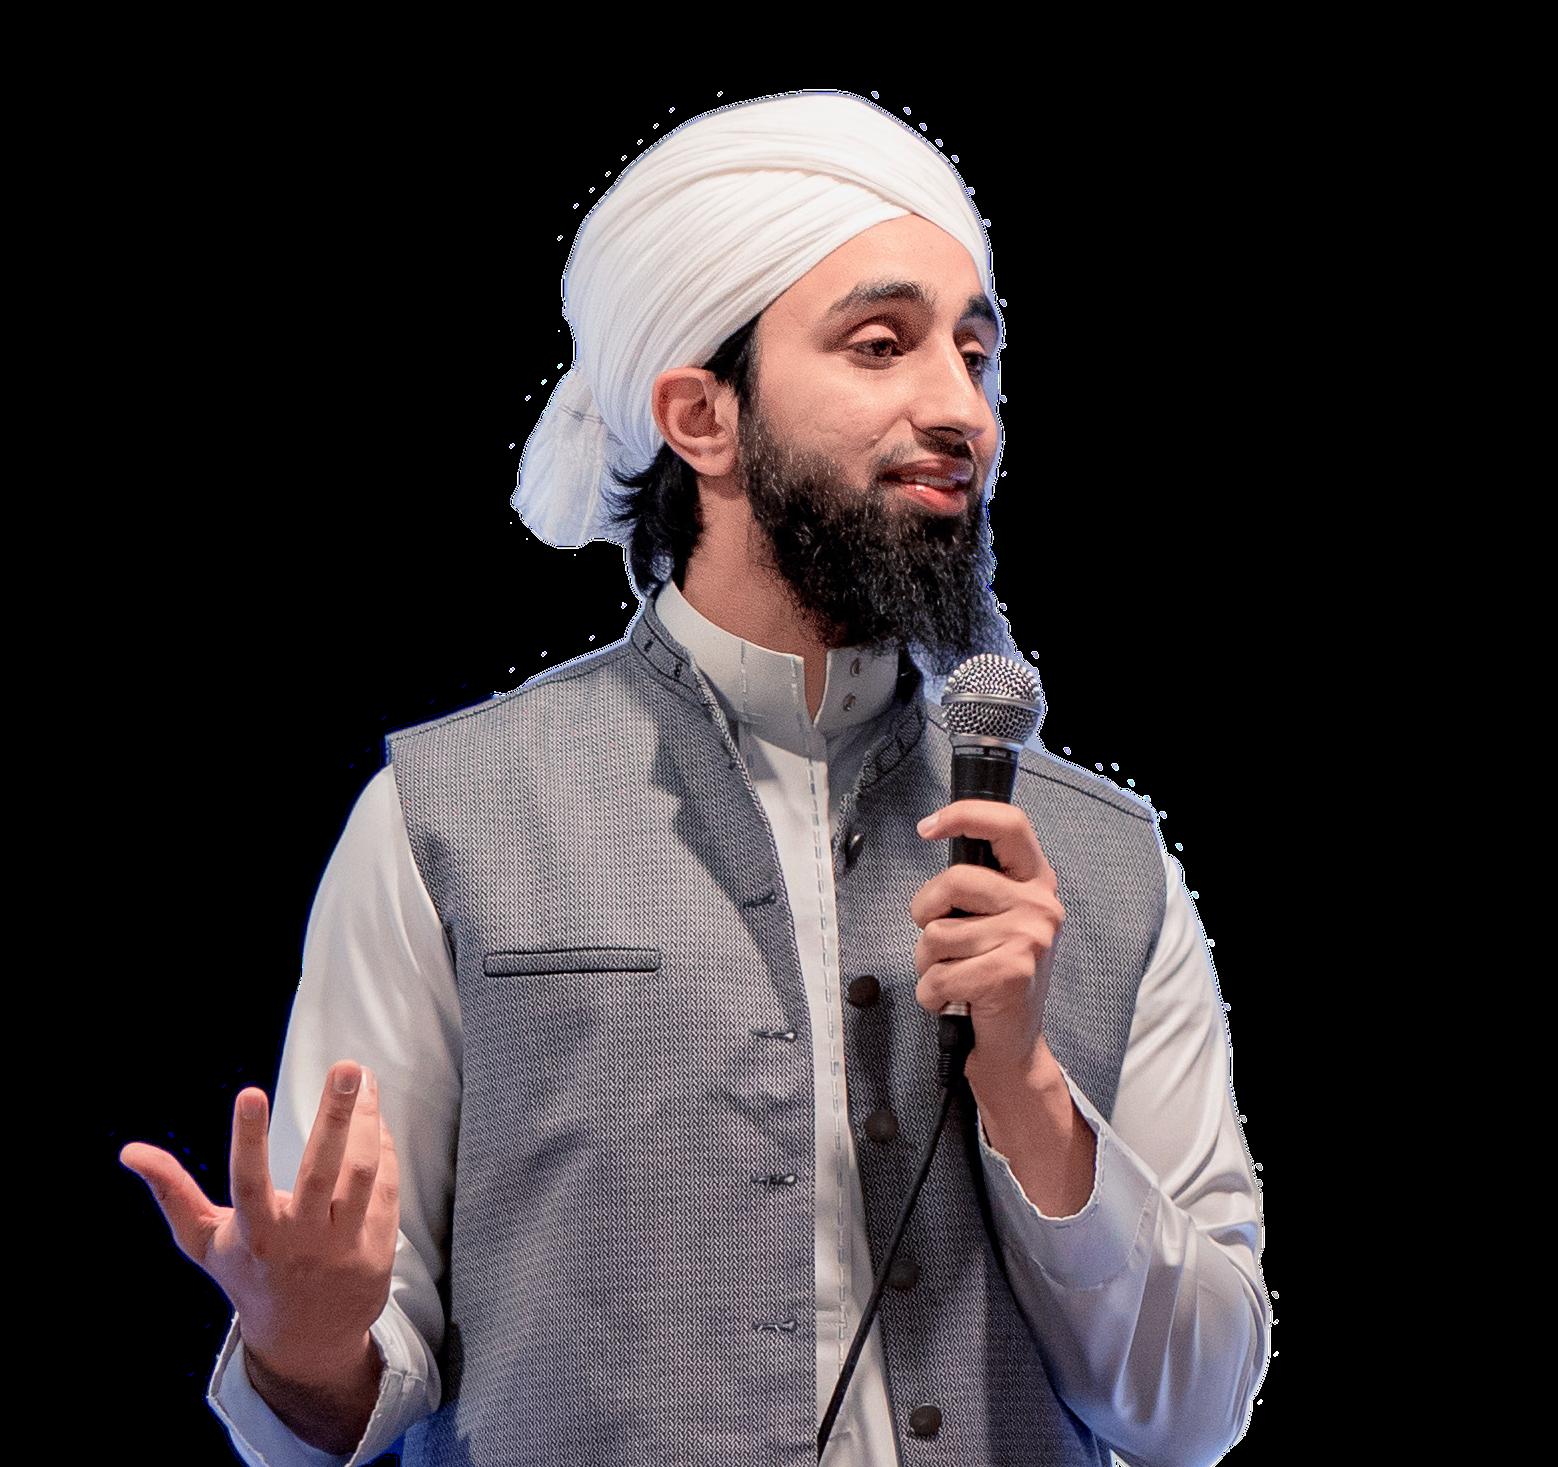 Mufti Abdul Wahab Waheed